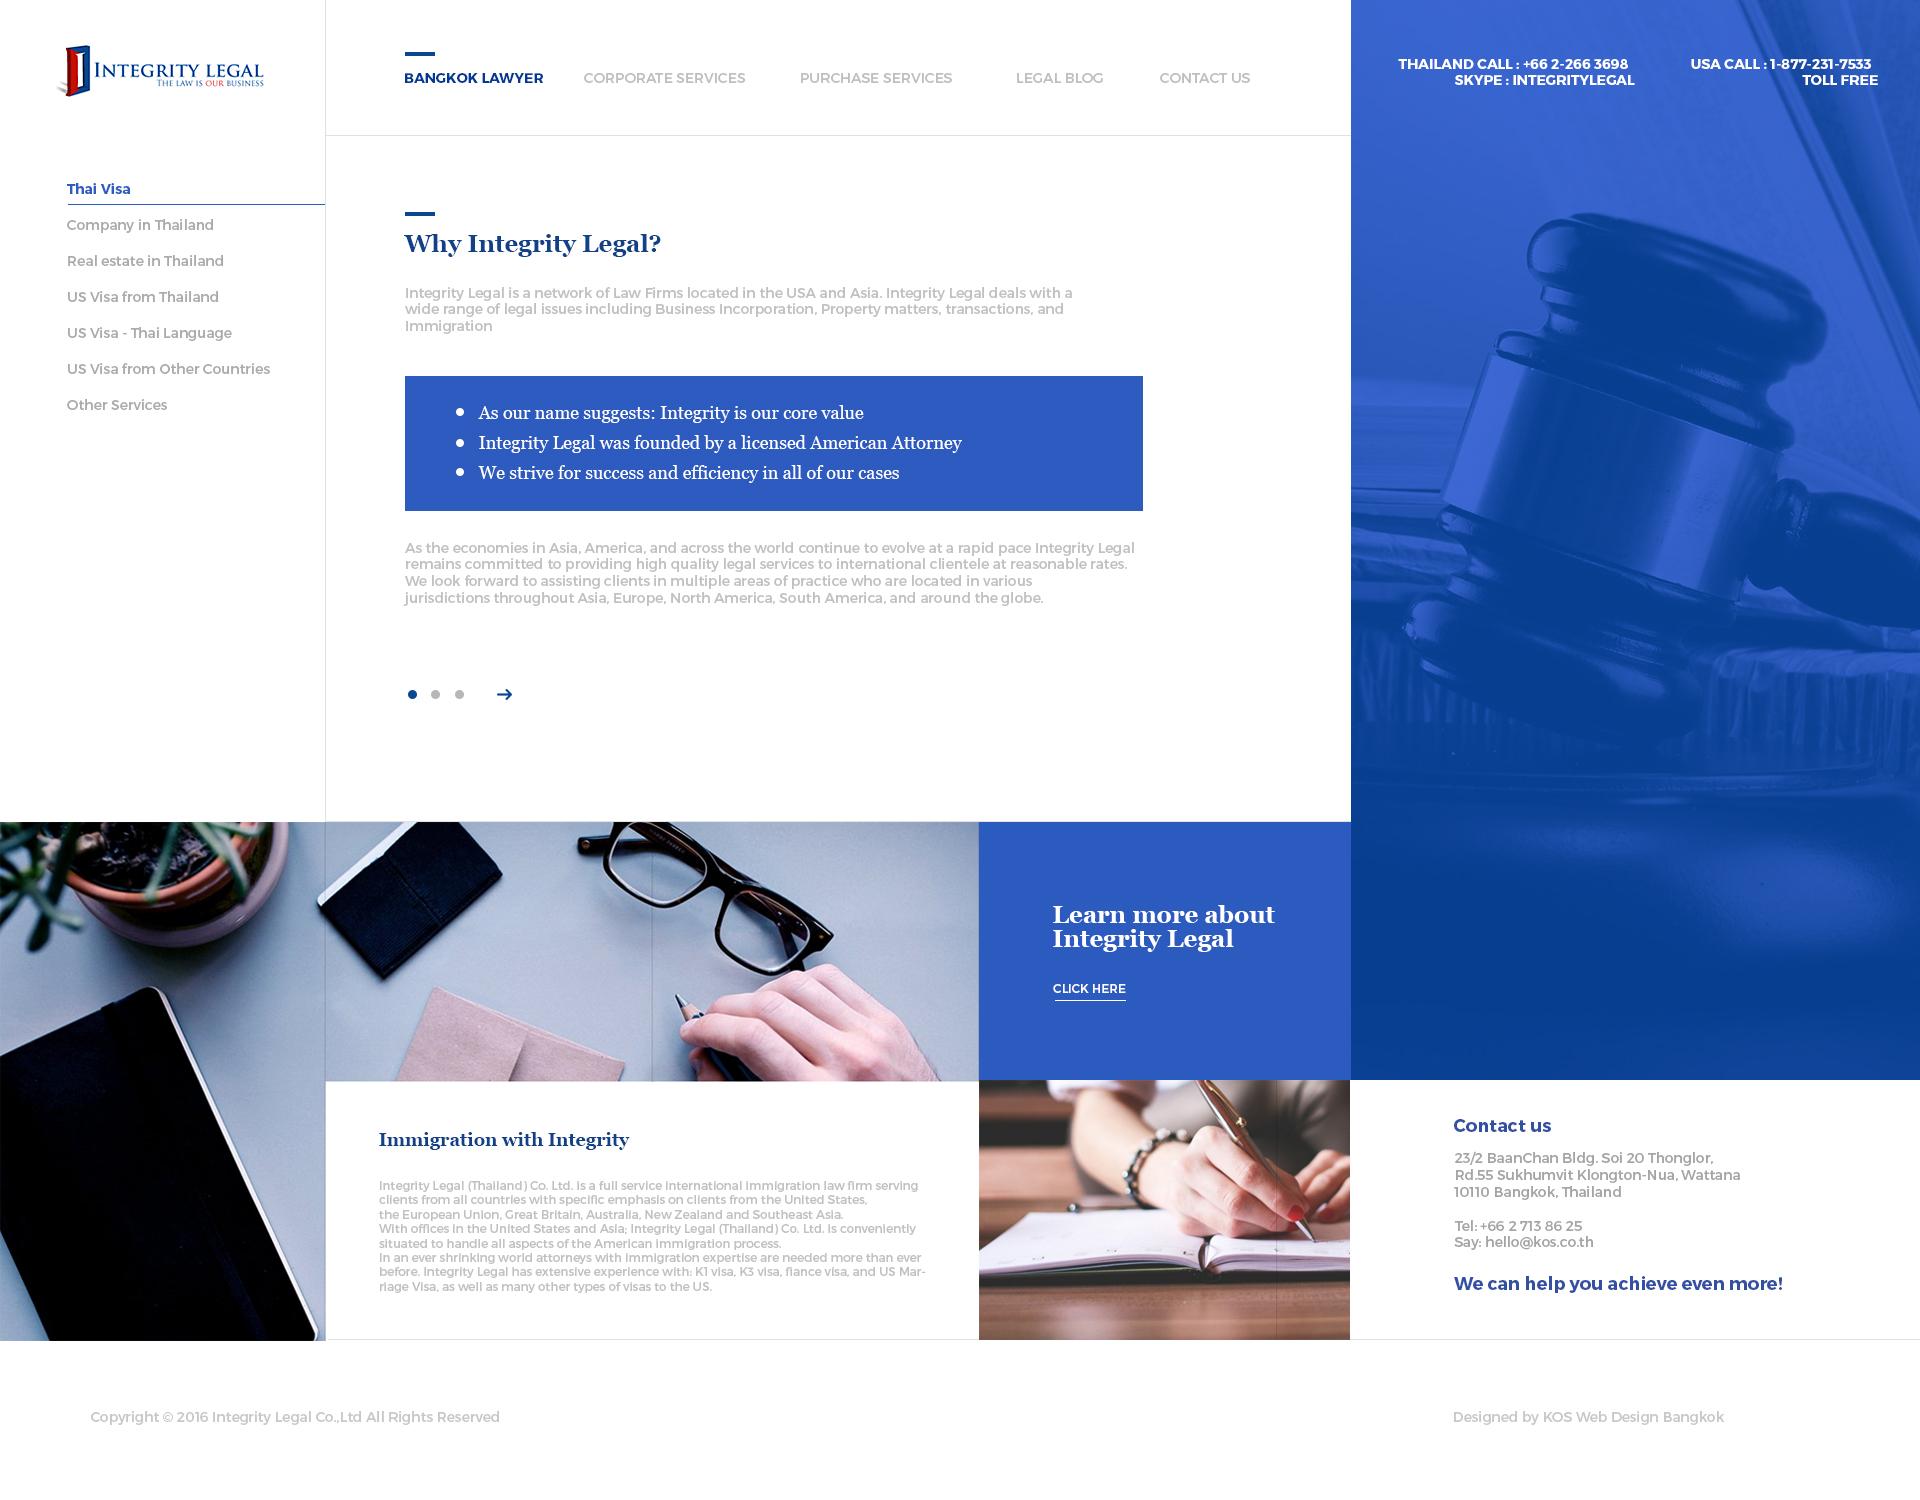 KOS Design - Integrity Legal